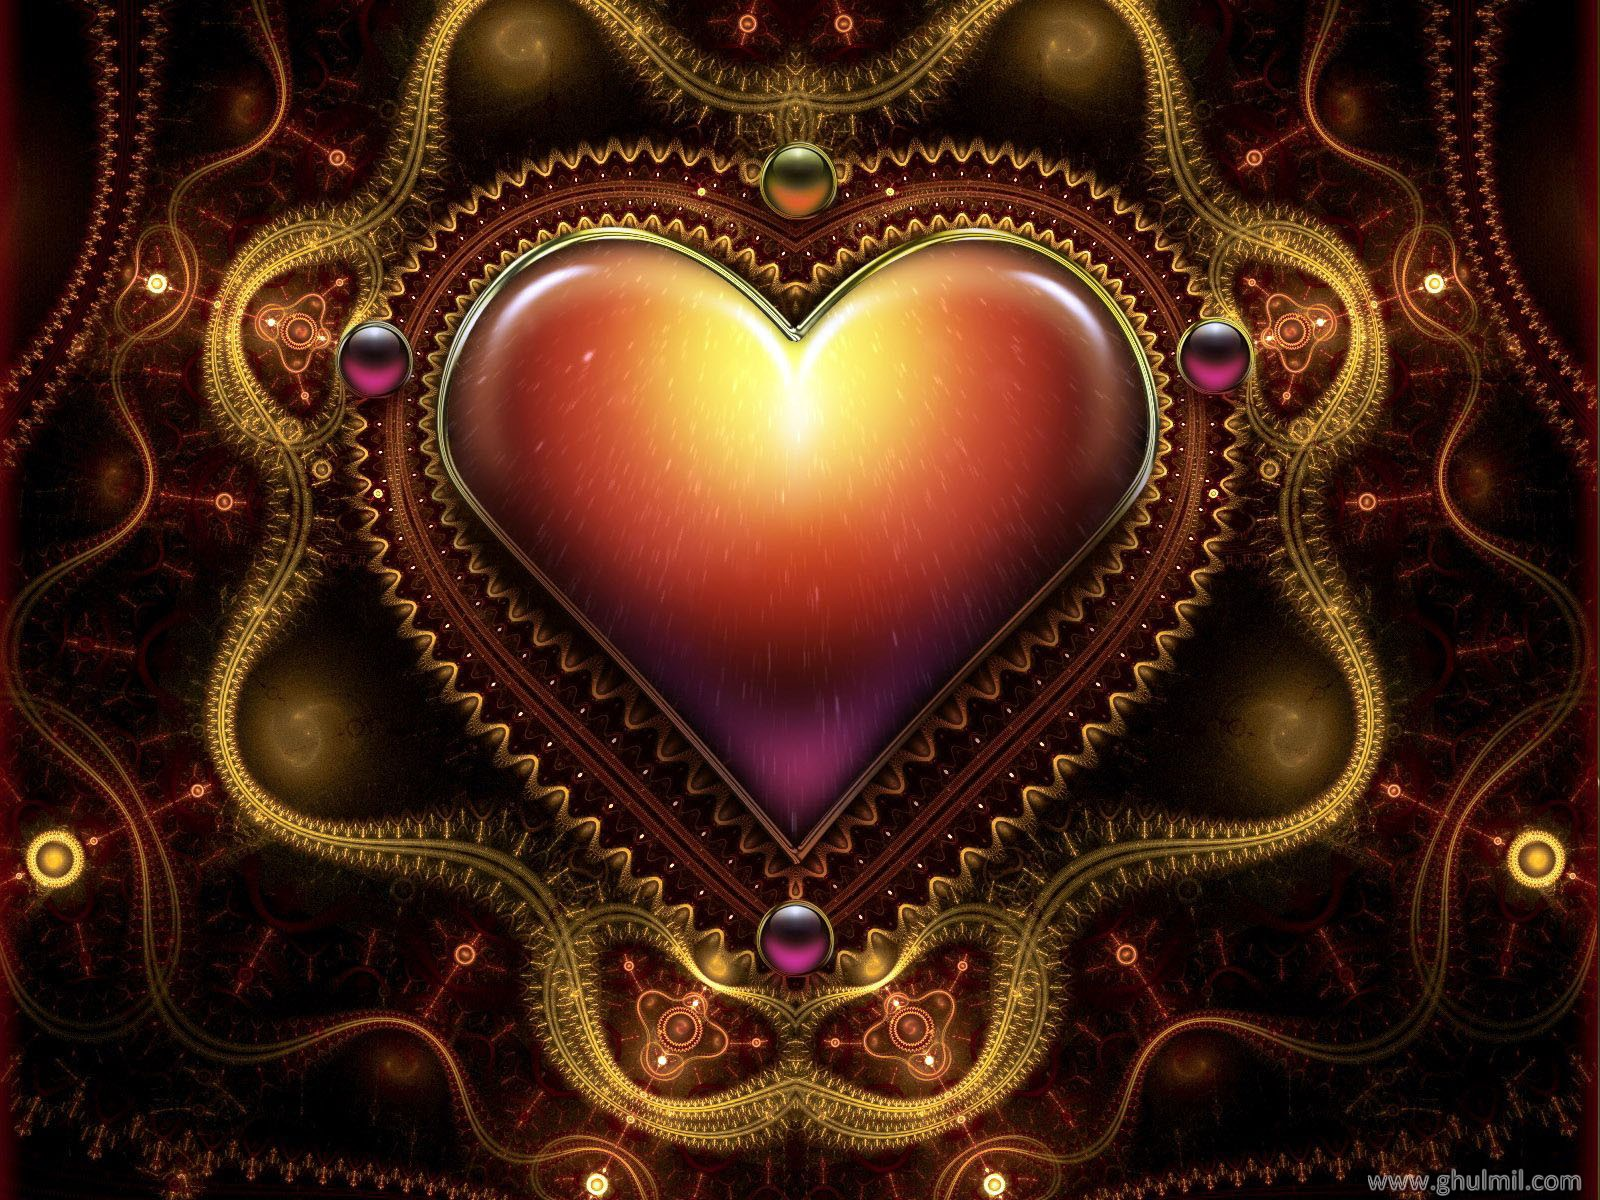 Beautiful 3d HD Heart Mobile Wallpaper | Free Mobile Wallpaper